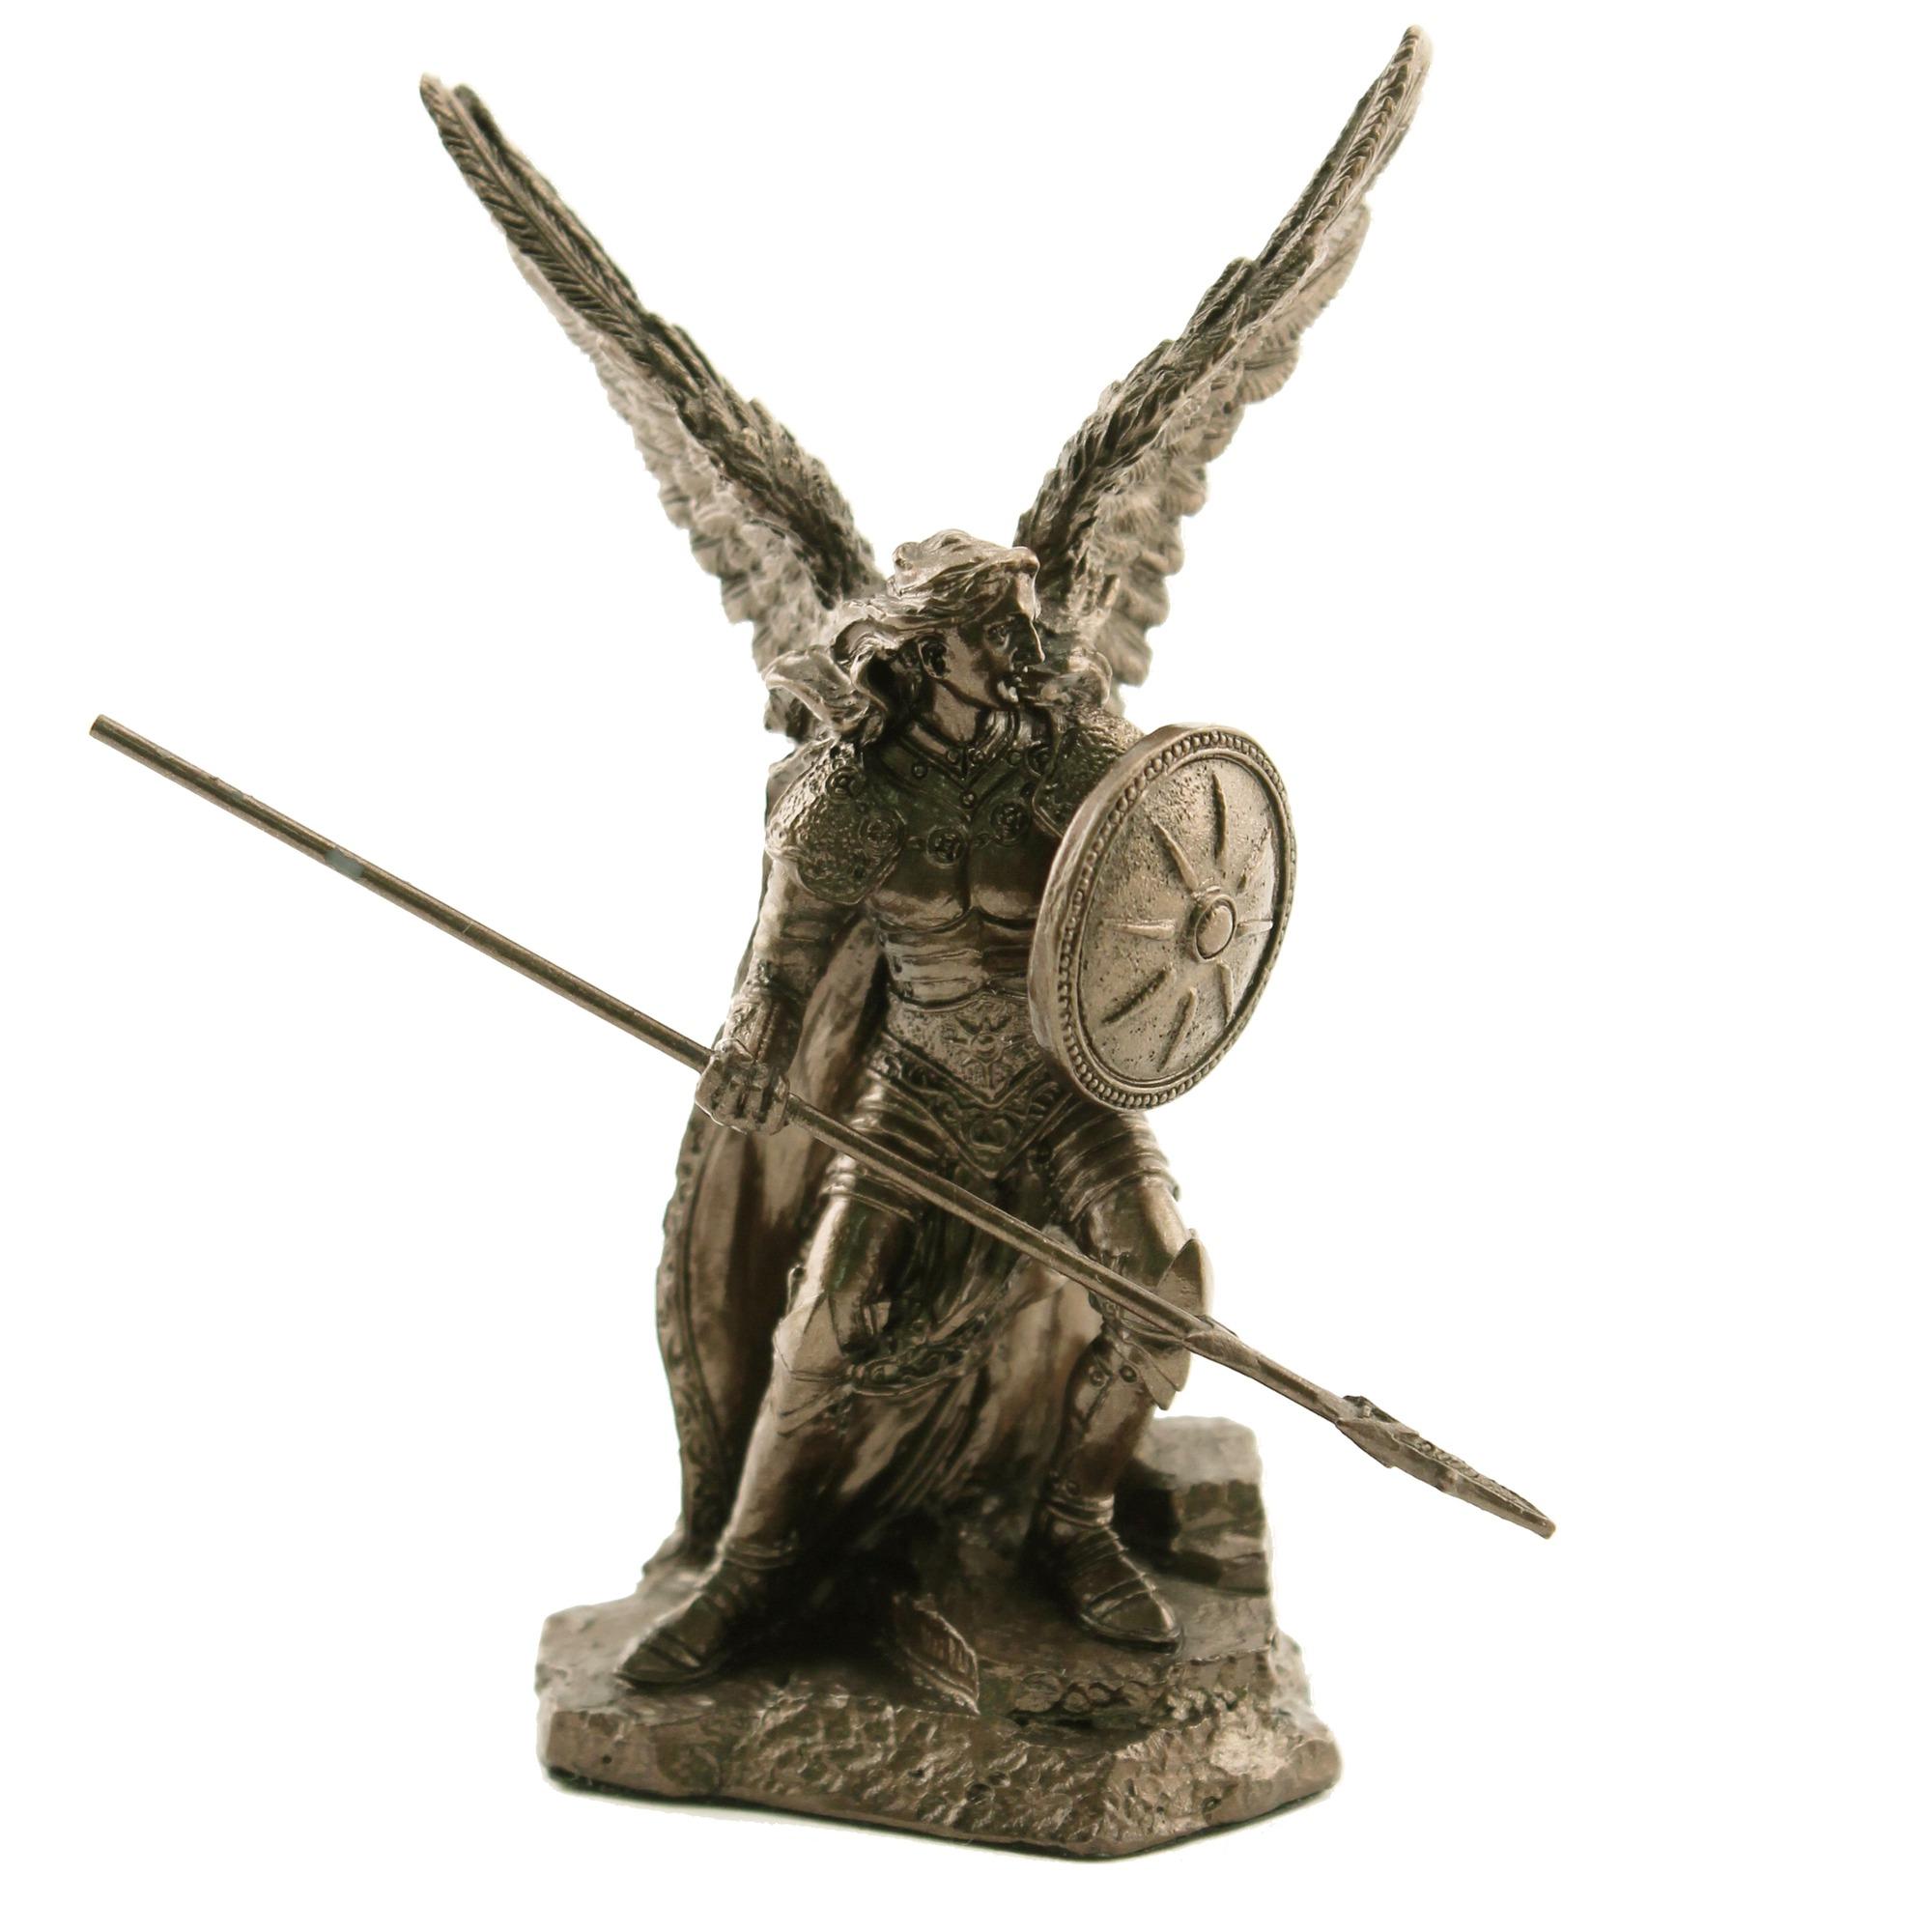 St raphael archangel veronese statue bronzed 4 inch the st raphael archangel veronese statue bronzed 4 inch buycottarizona Images